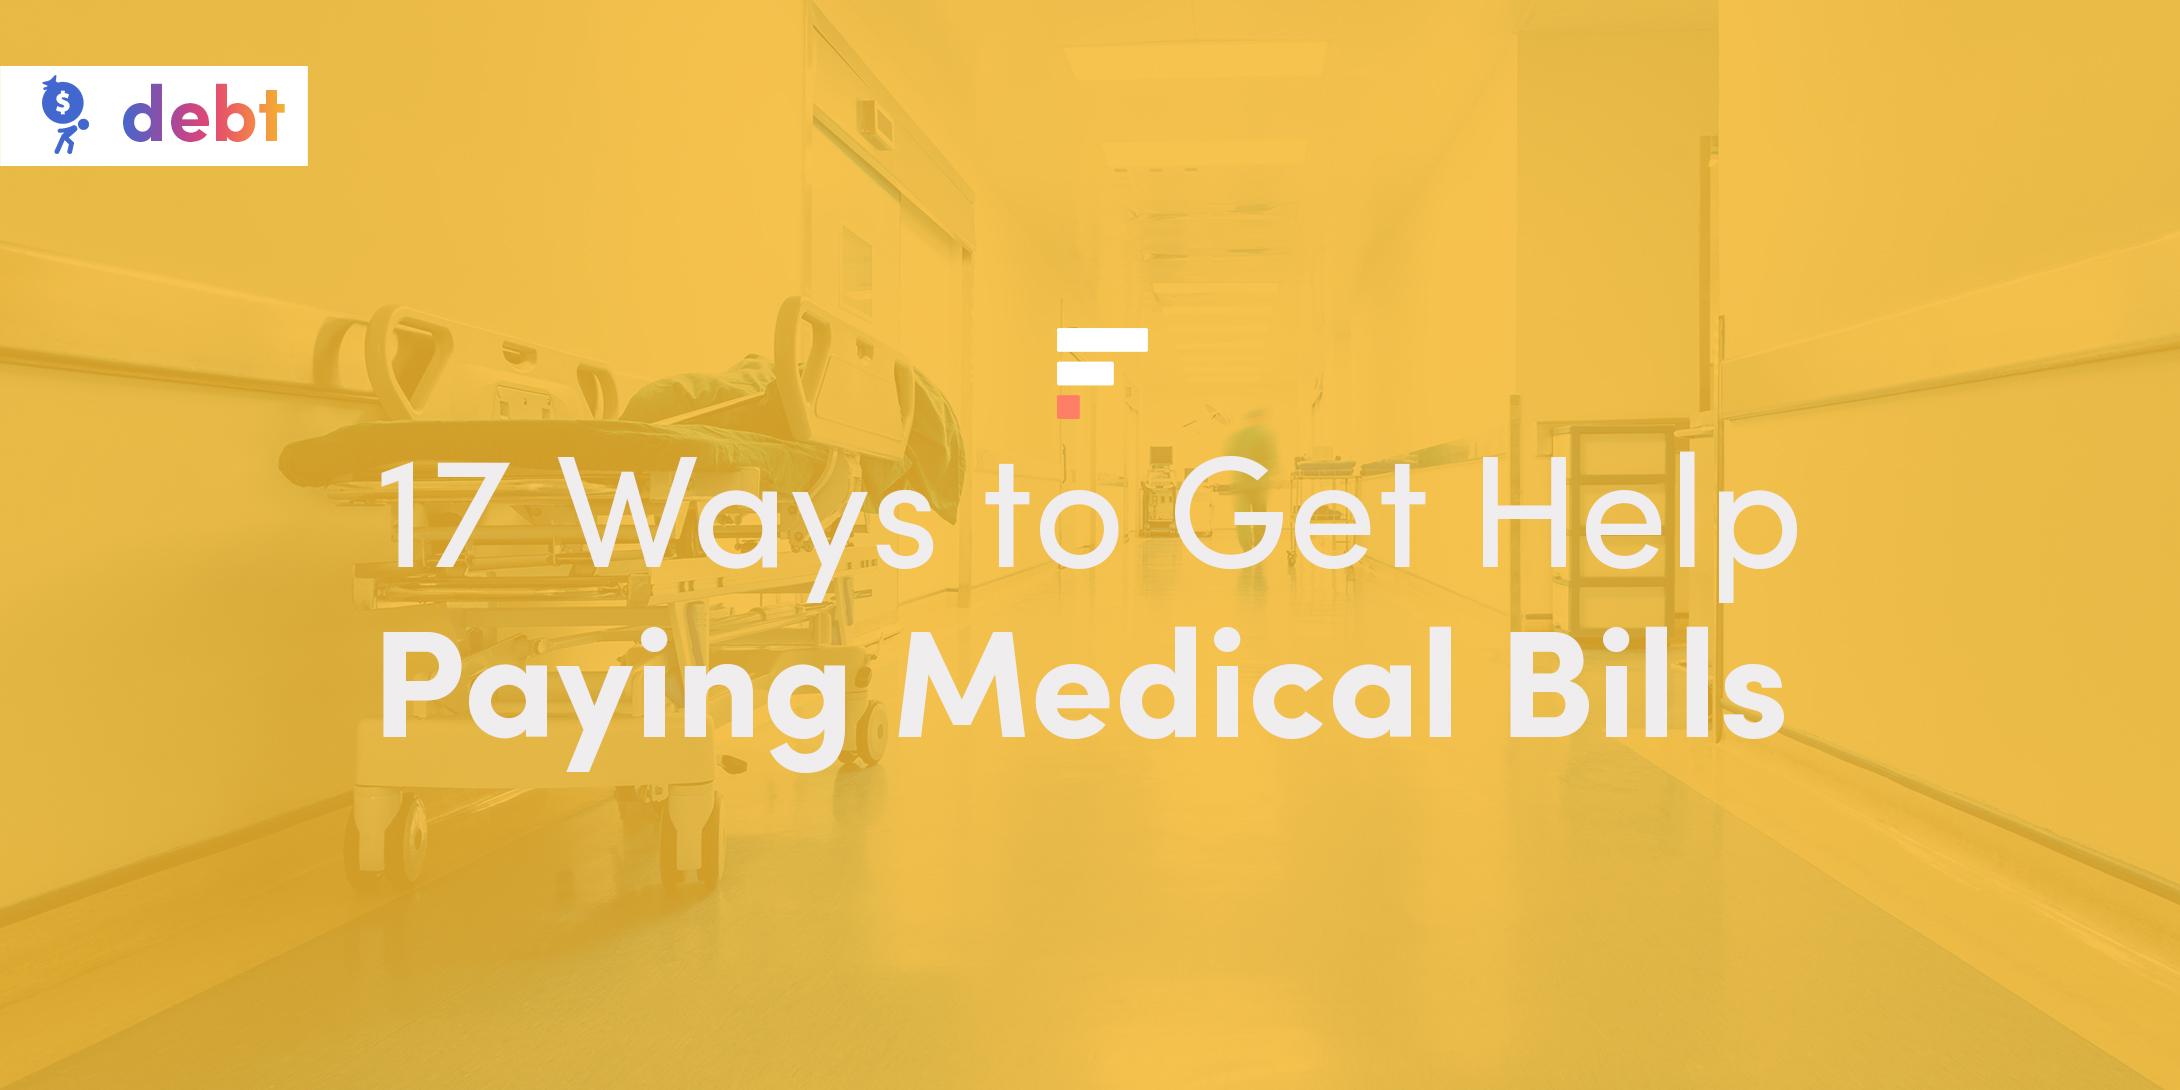 17 Ways to Get Help Paying Medical Bills in 2021